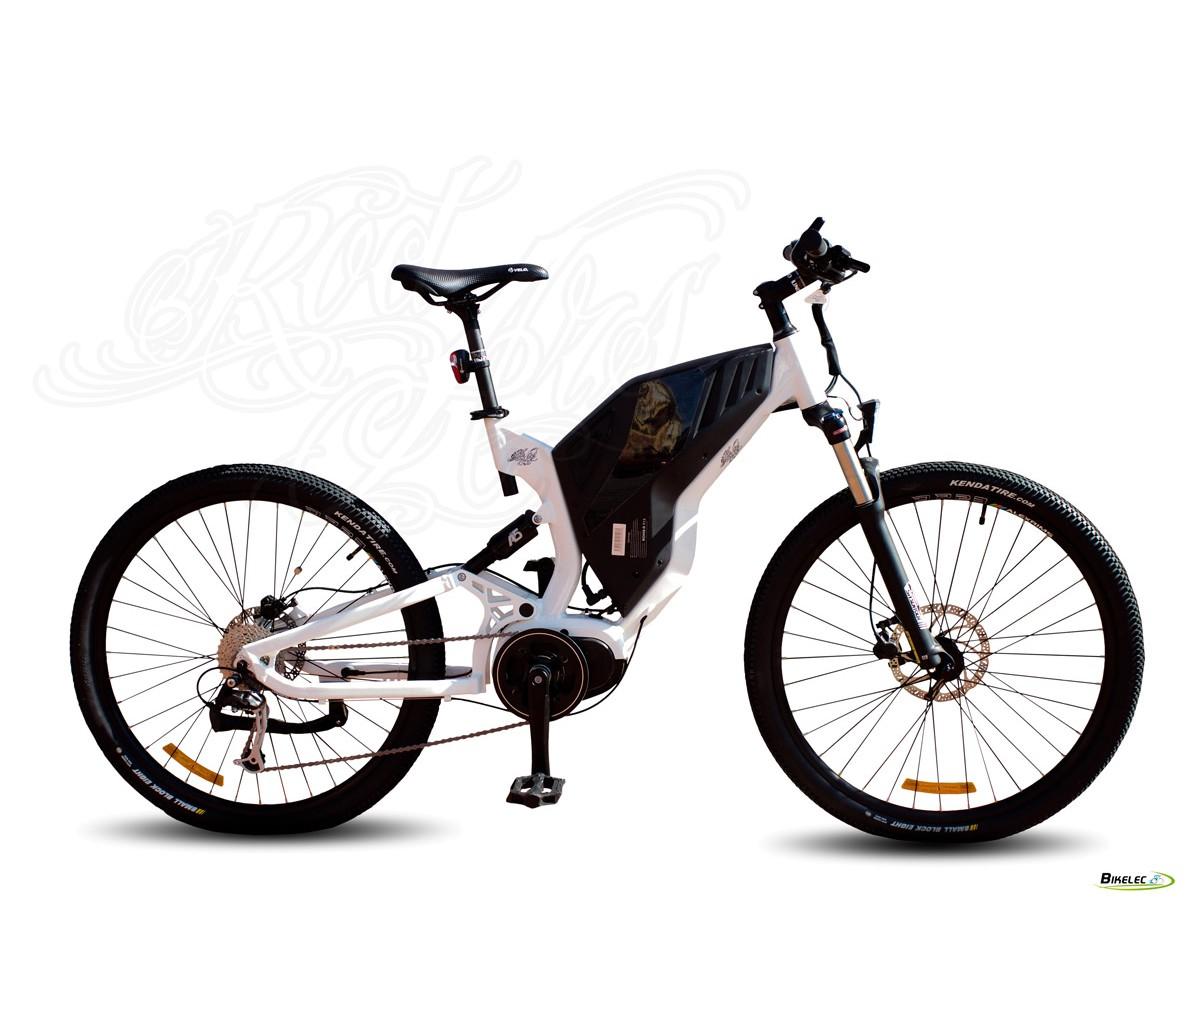 bicis-gredos-bikelec